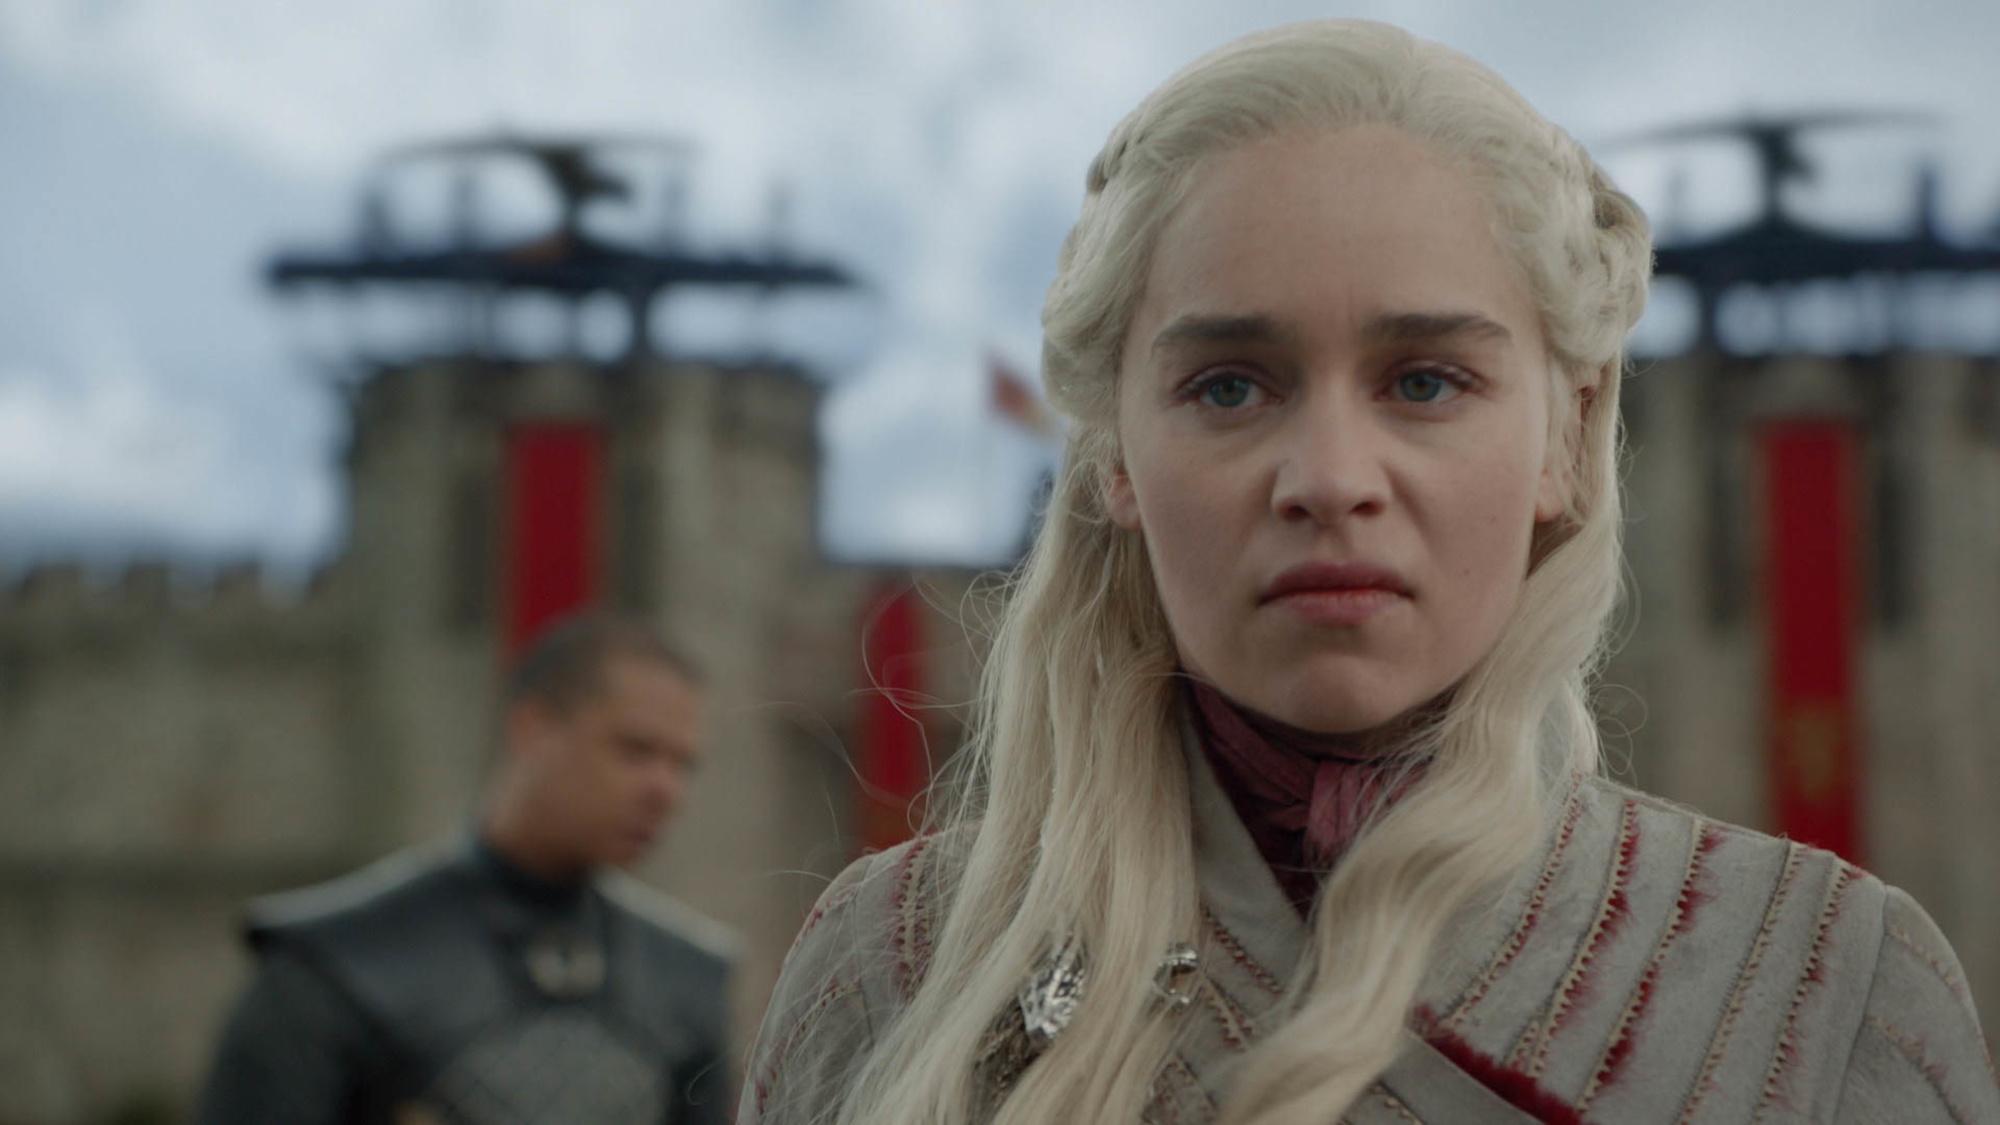 Emilia Clarke as Daenerys Targaryen on 'Game of Thrones,' Season 8.